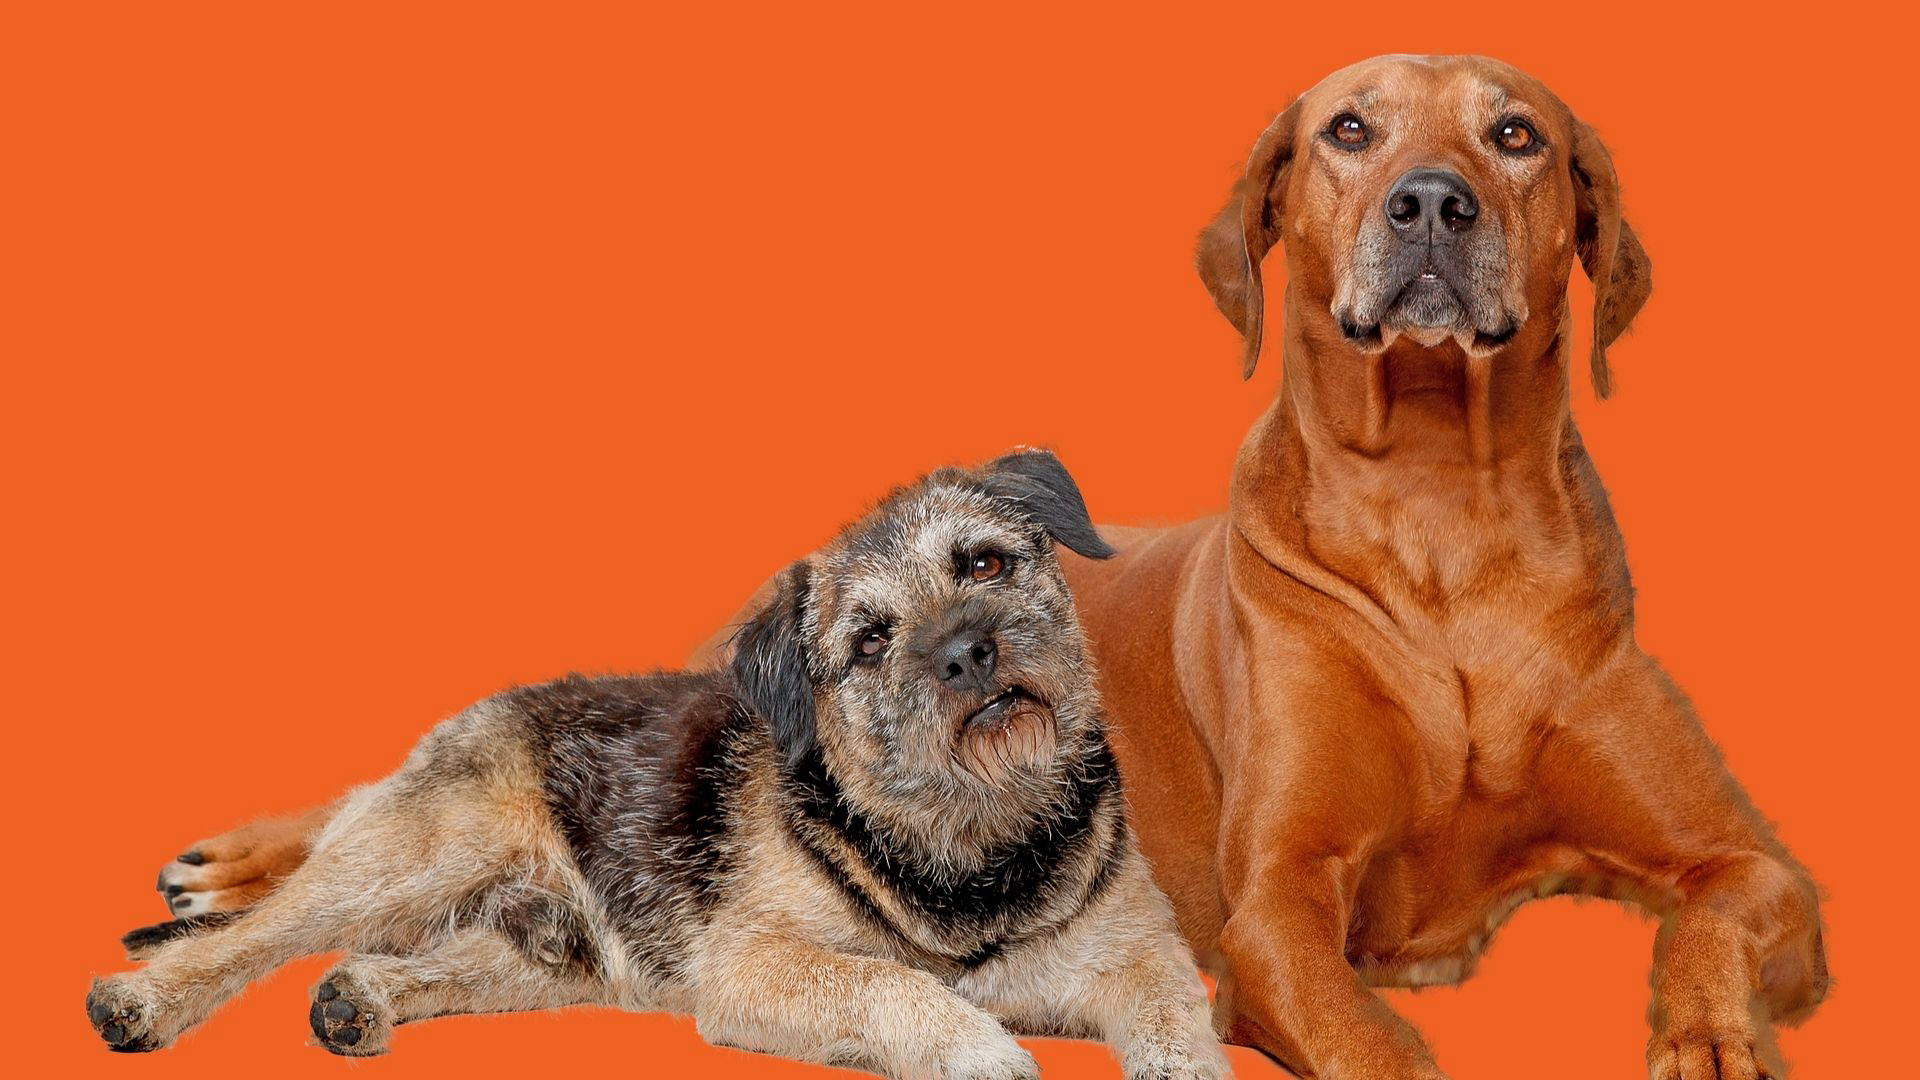 Episode-272-Animals-Dogs